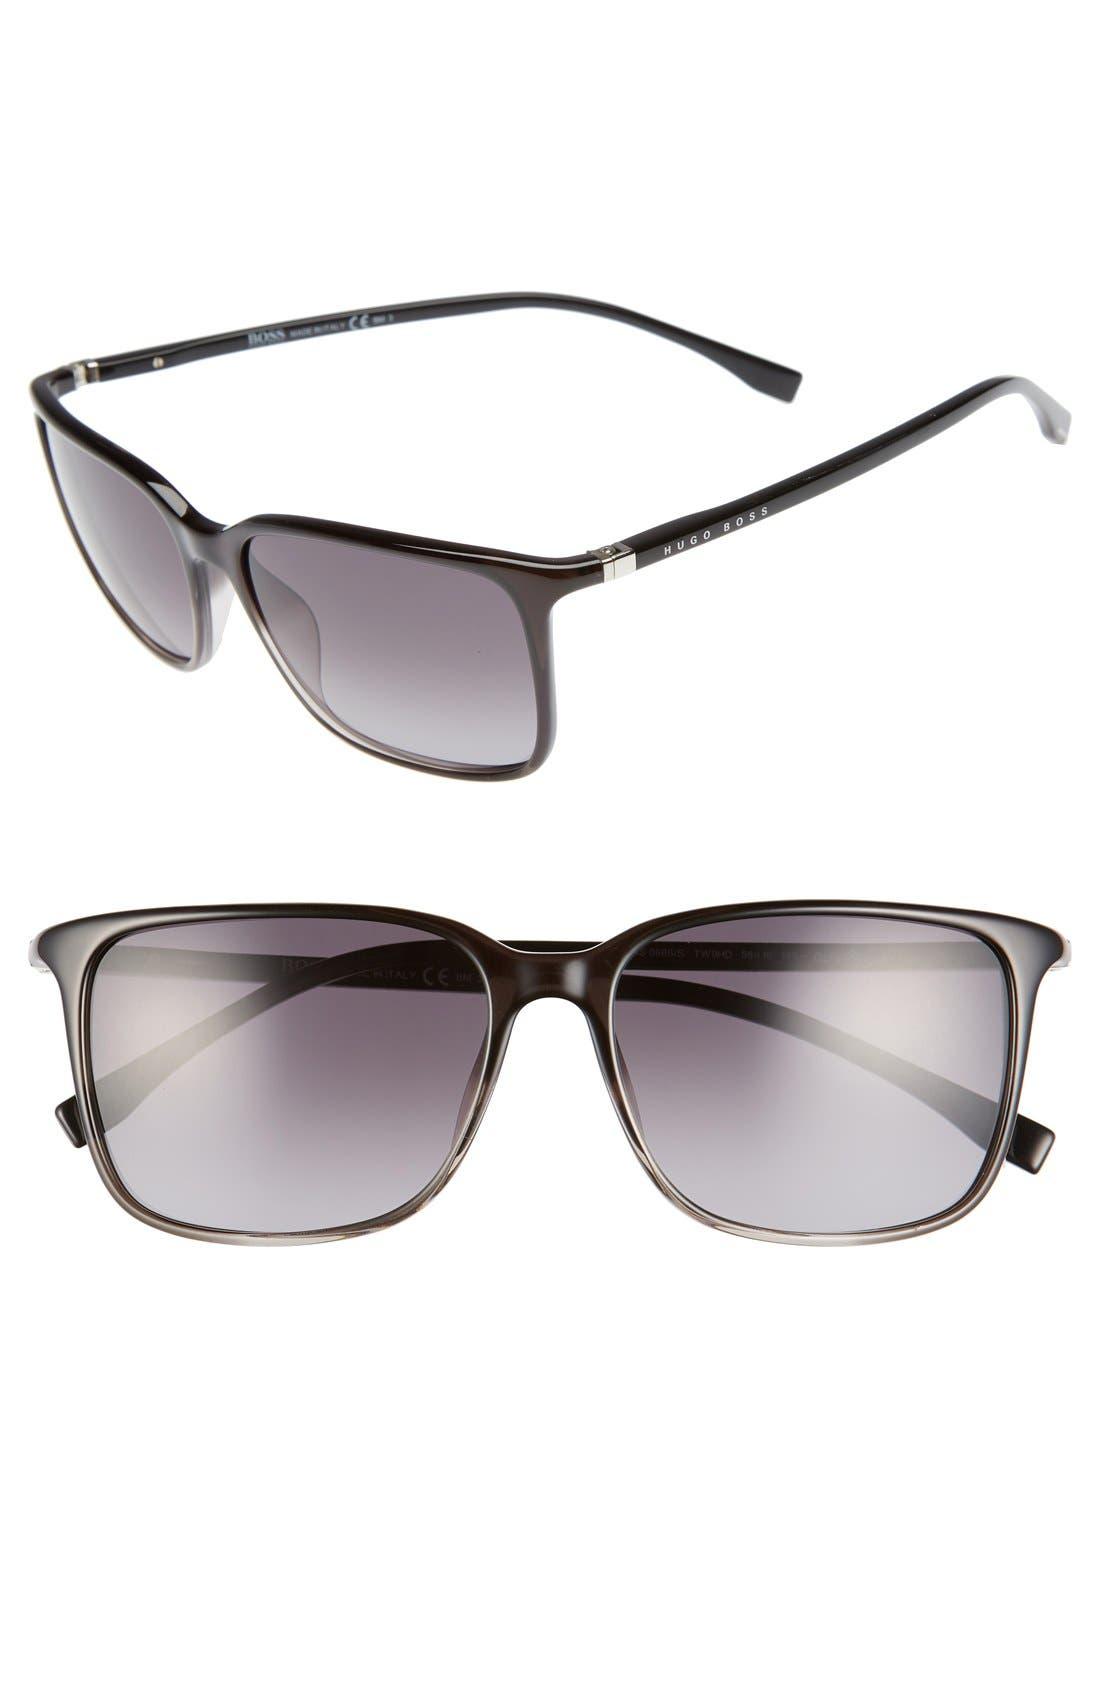 BOSS '0666/S' 52mm Sunglasses